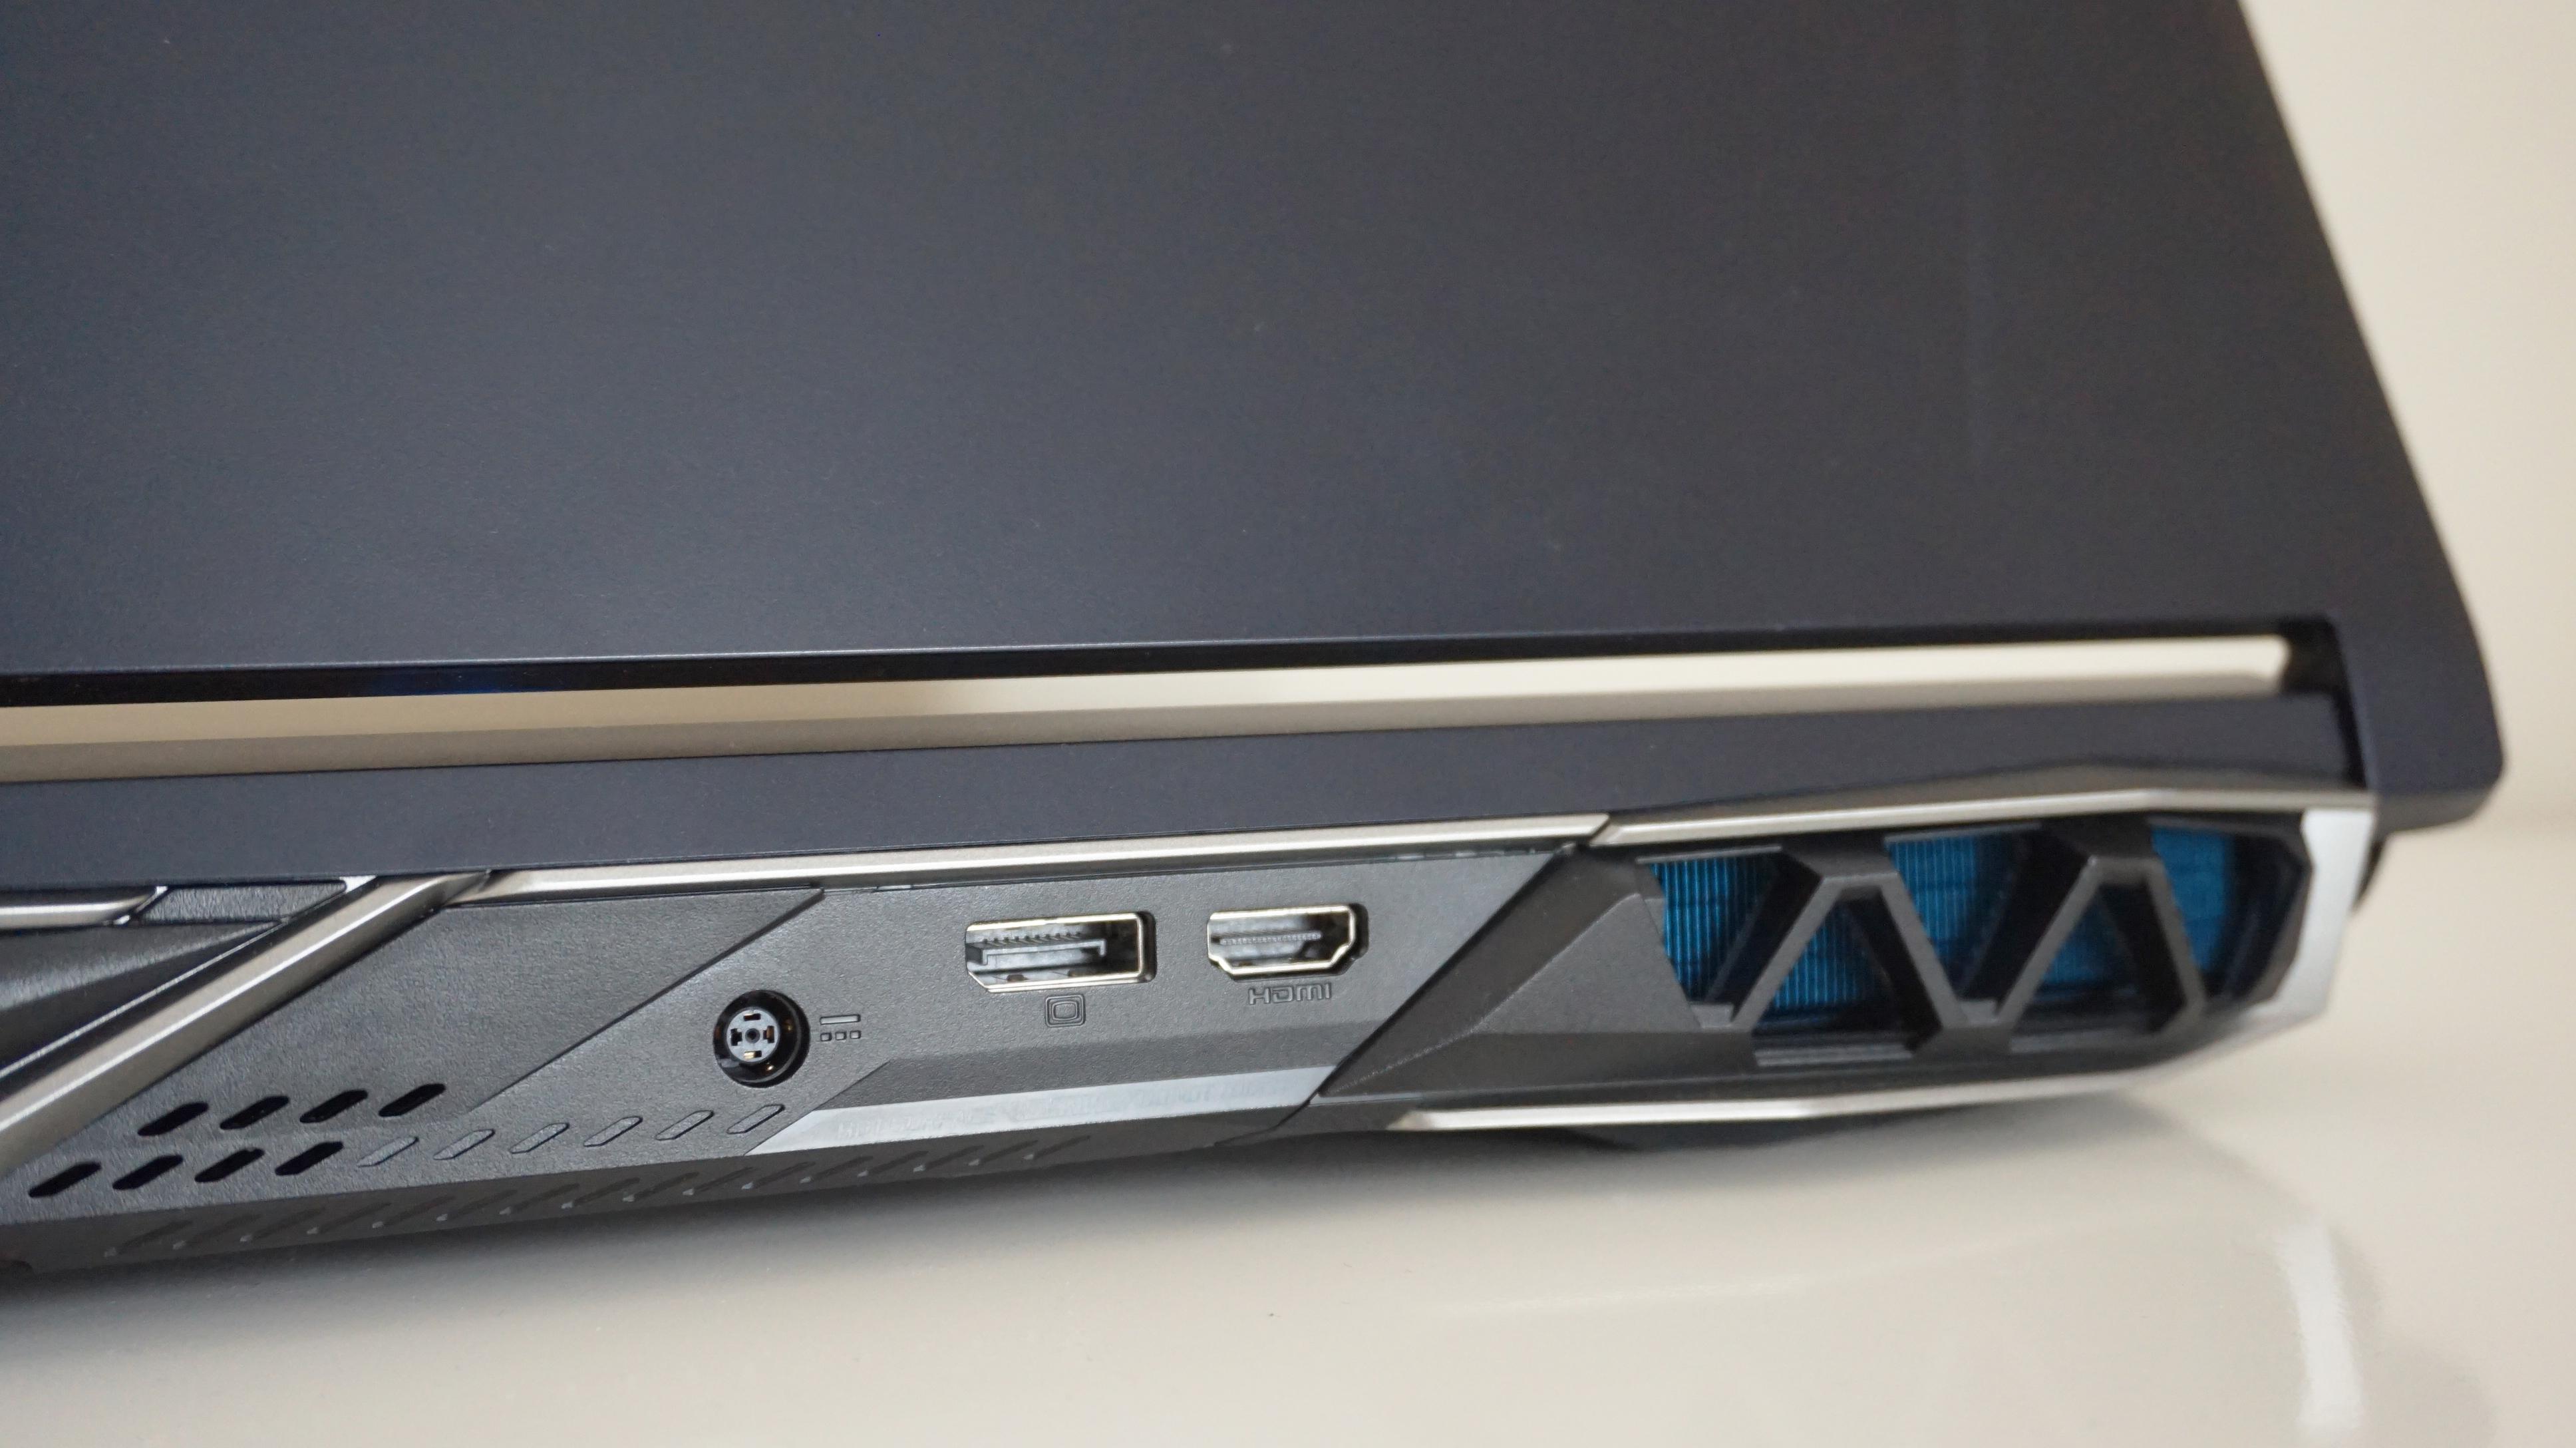 Acer Predator Helios 500 review: GTX 1070 vs Vega 56 | Rock